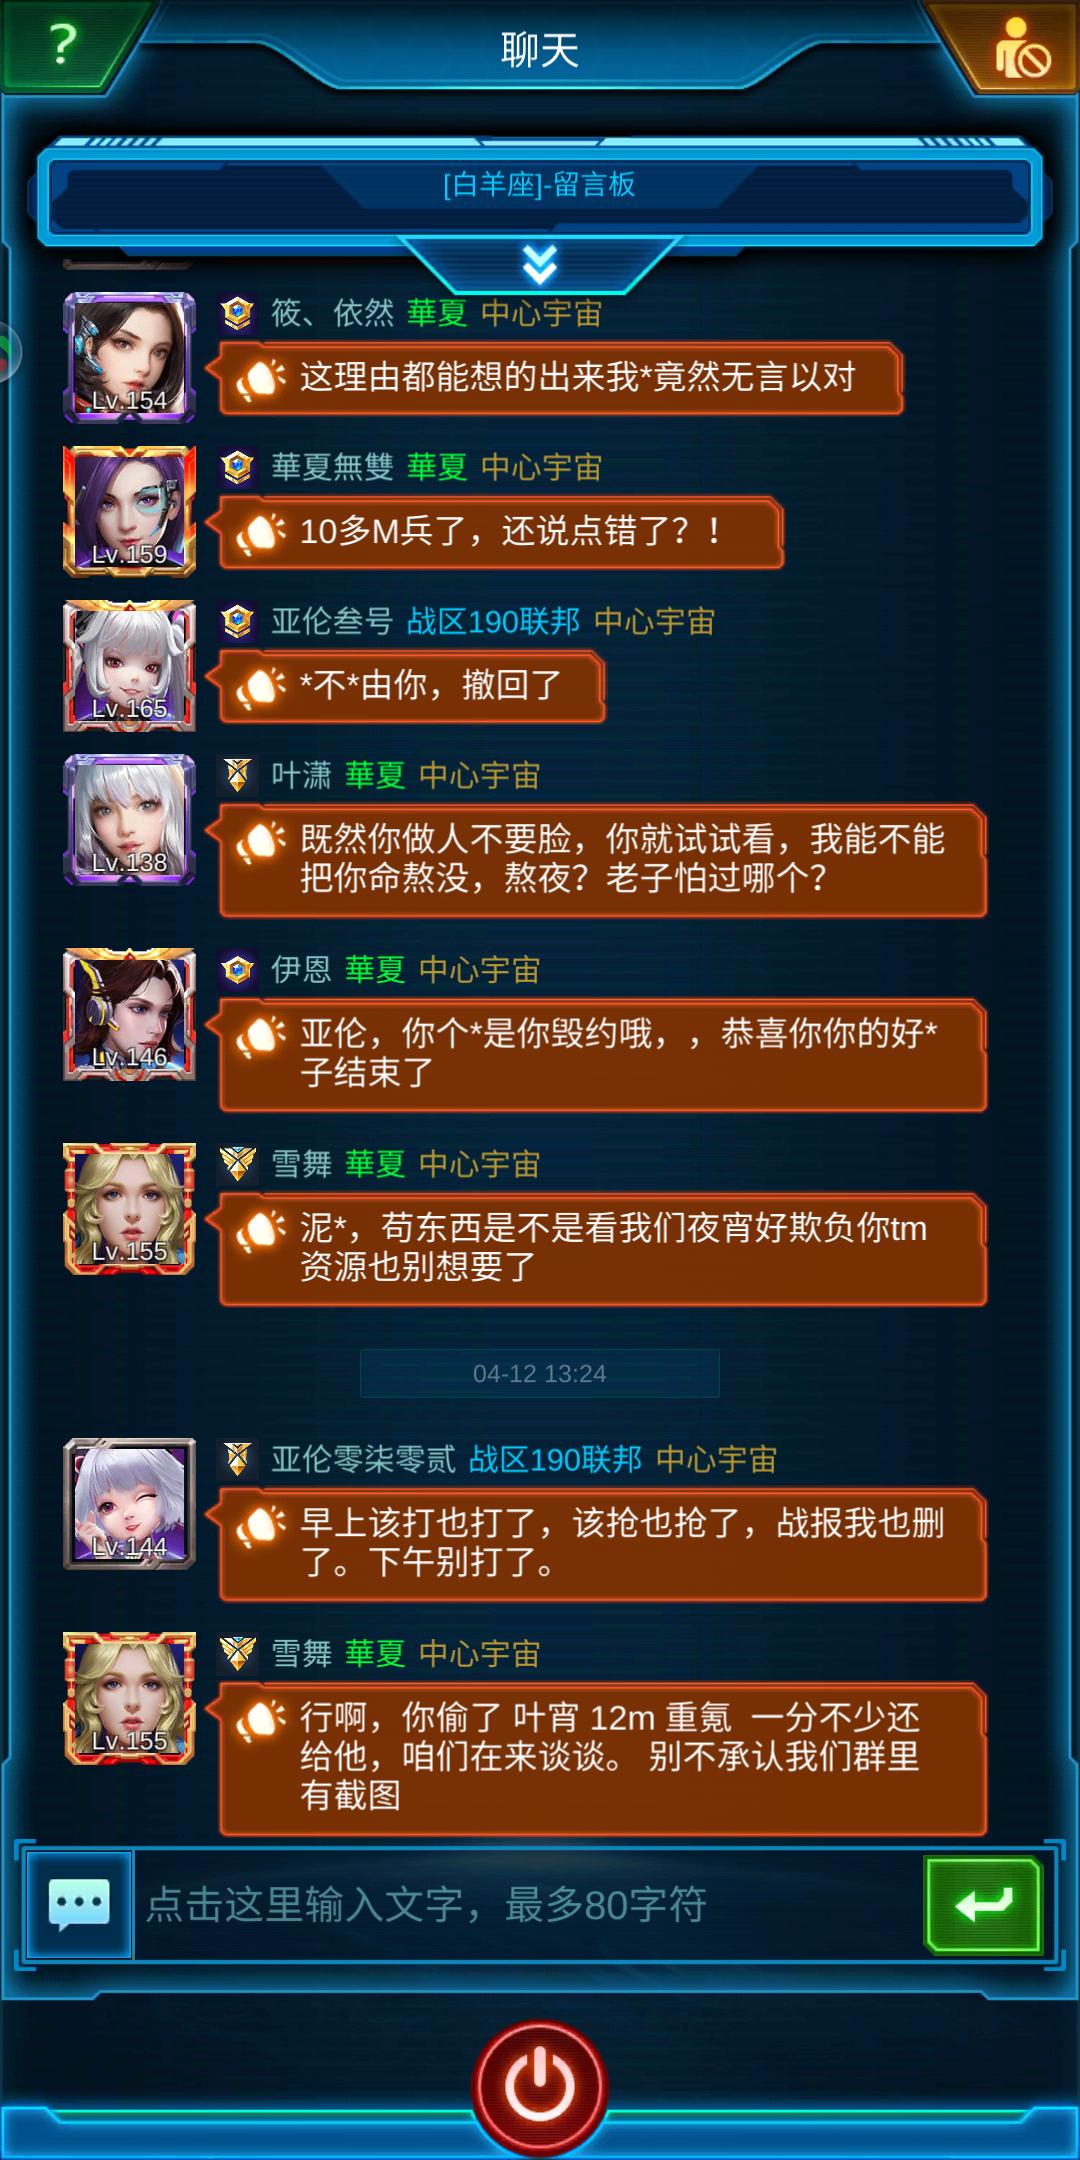 Screenshot_2020-04-12-13-38-48-89.png